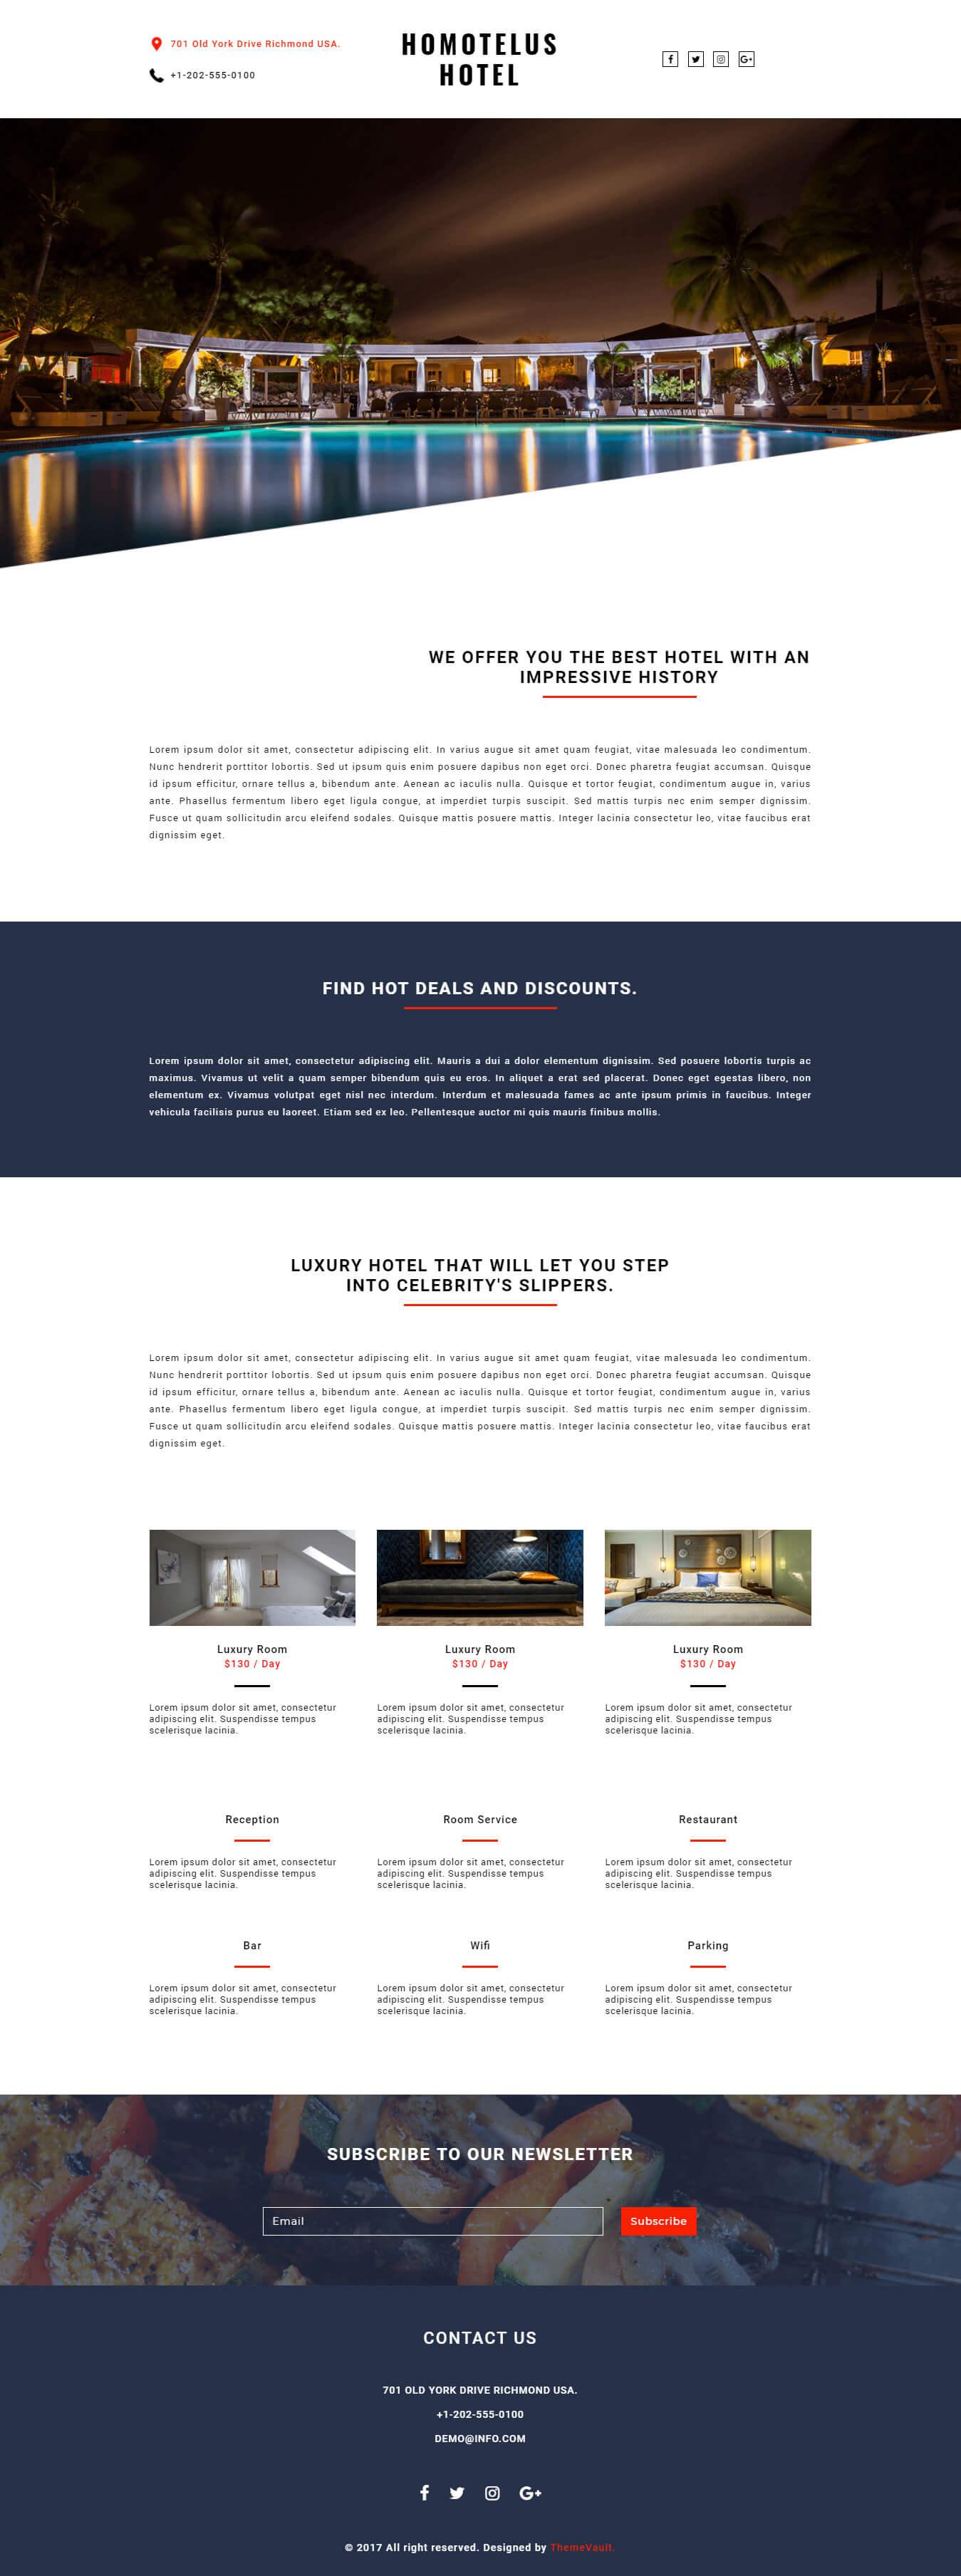 Homotelus – Responsive HTML Email Newsletter Templates